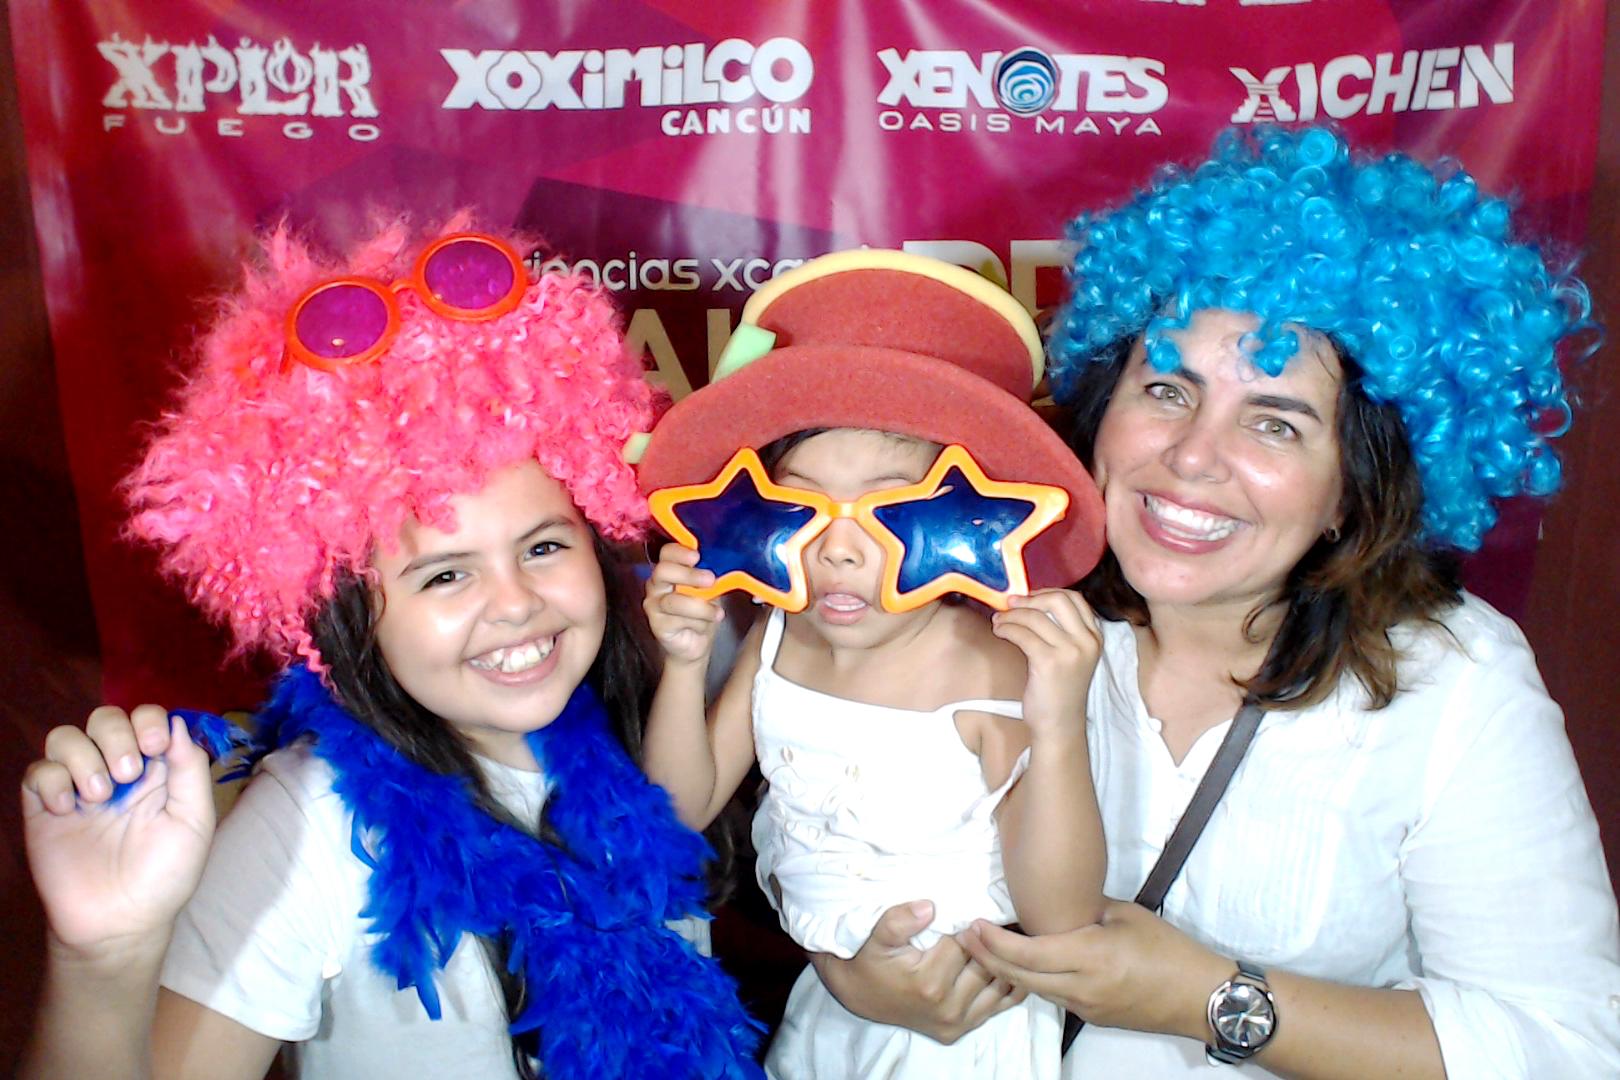 PhotoBoothRivieraMayaMexico0038.JPG